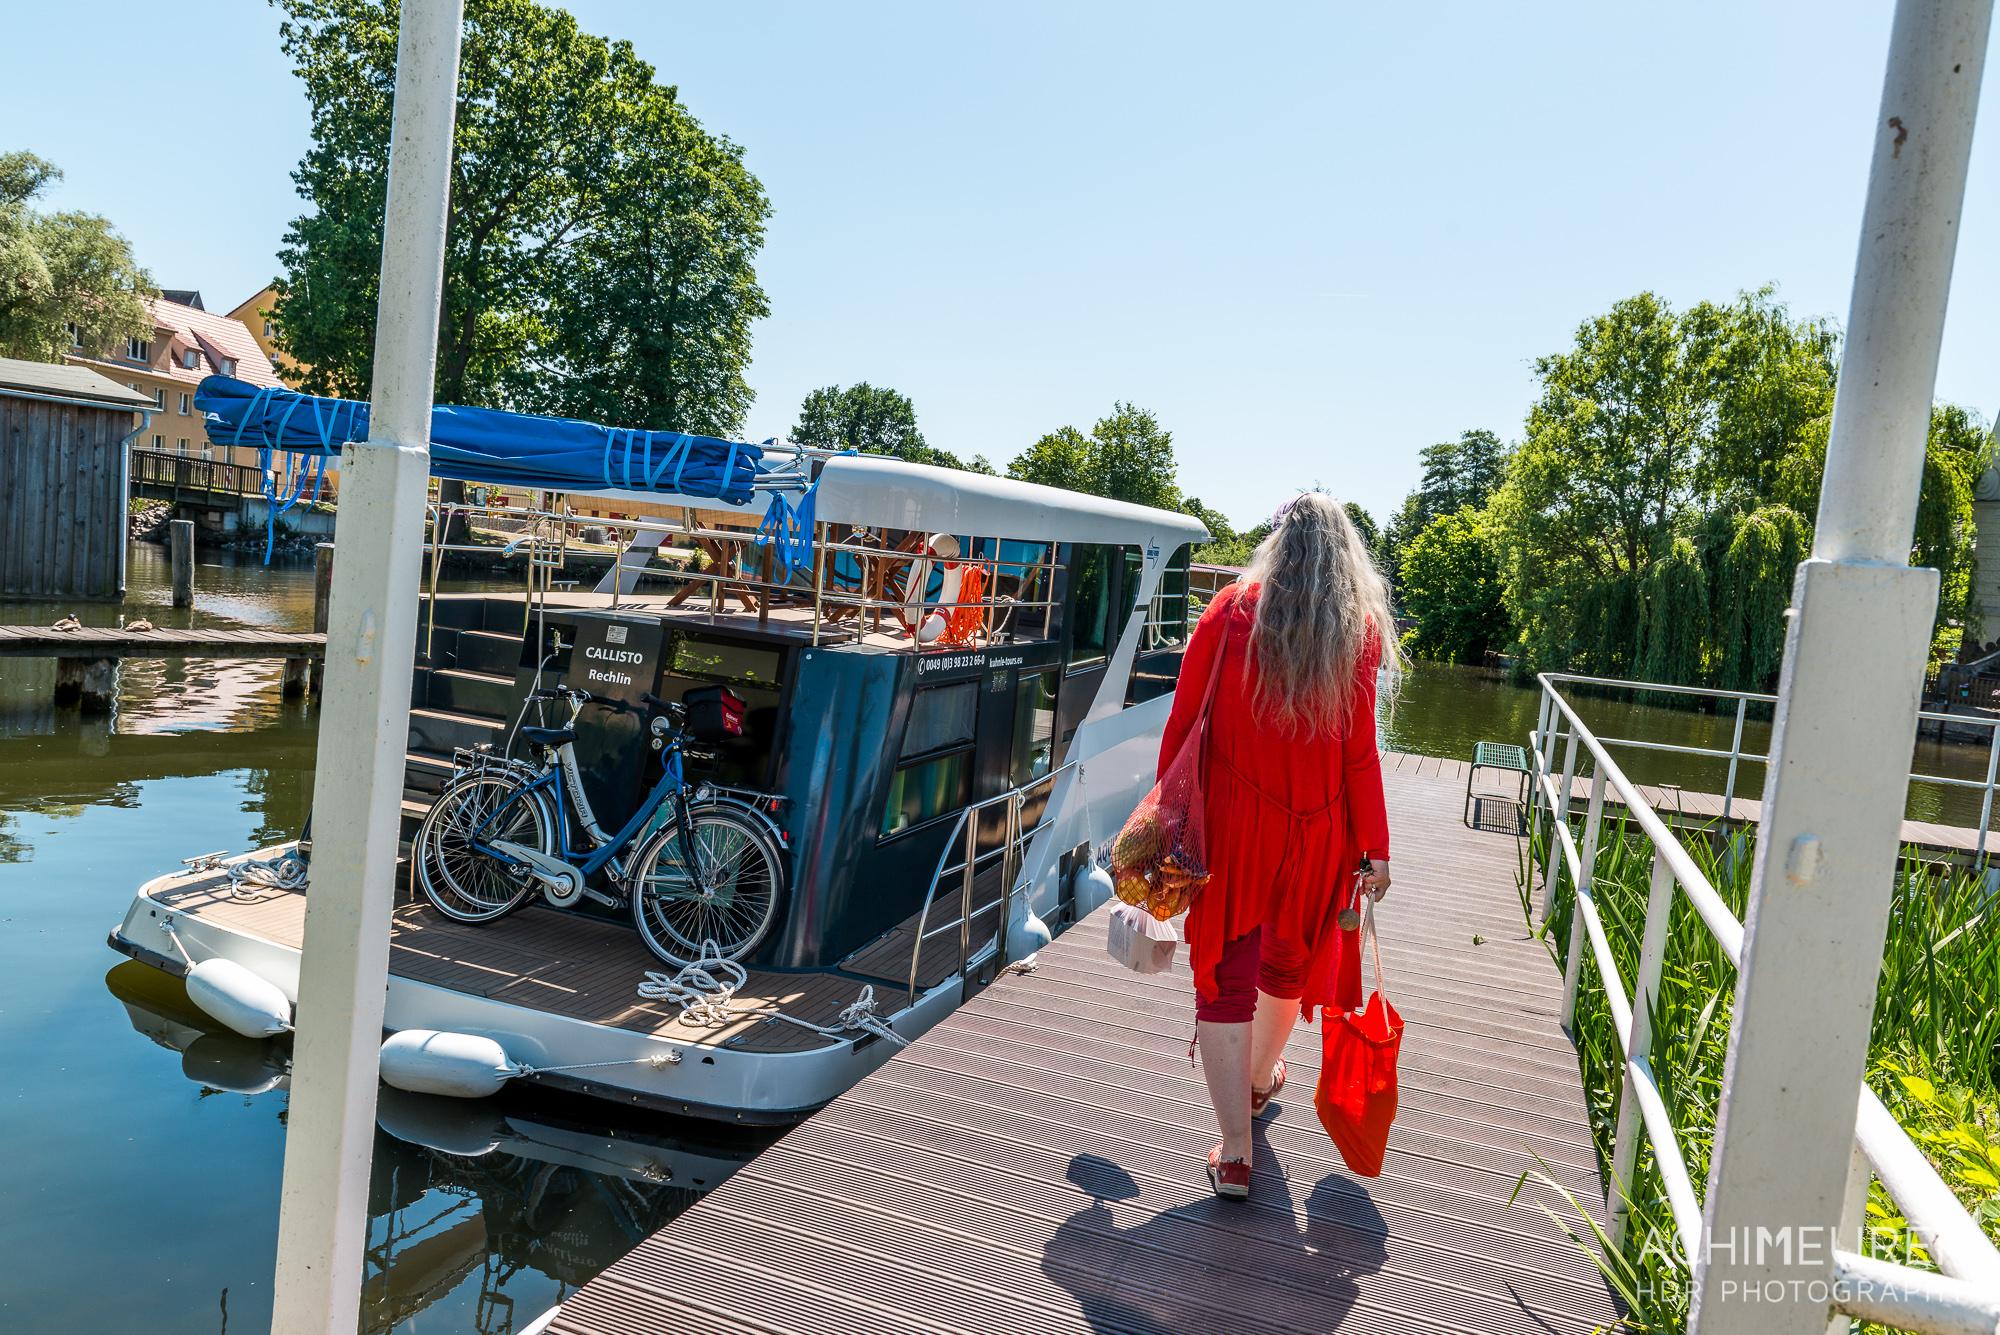 Hausboot-Kuhnle-Mueritz-Mecklenburg-Vorpommern-See_3169